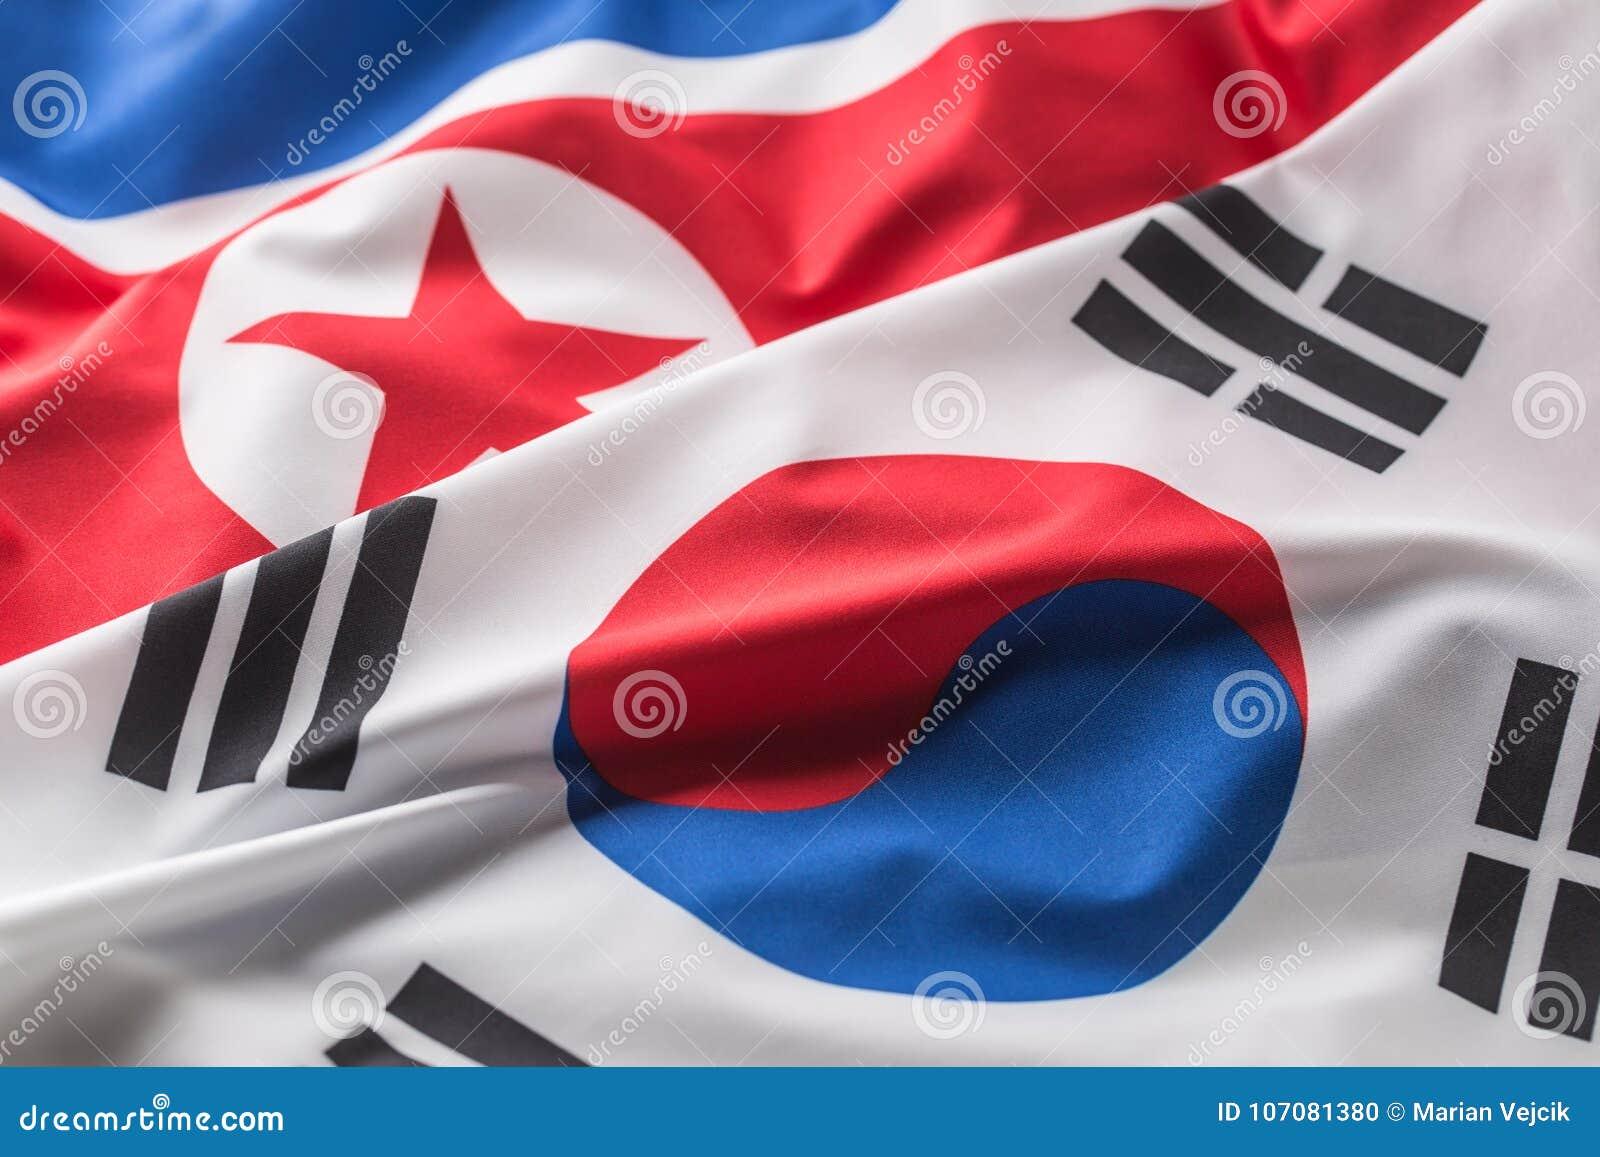 North and south korea flag. Colorful south and North Korea flag